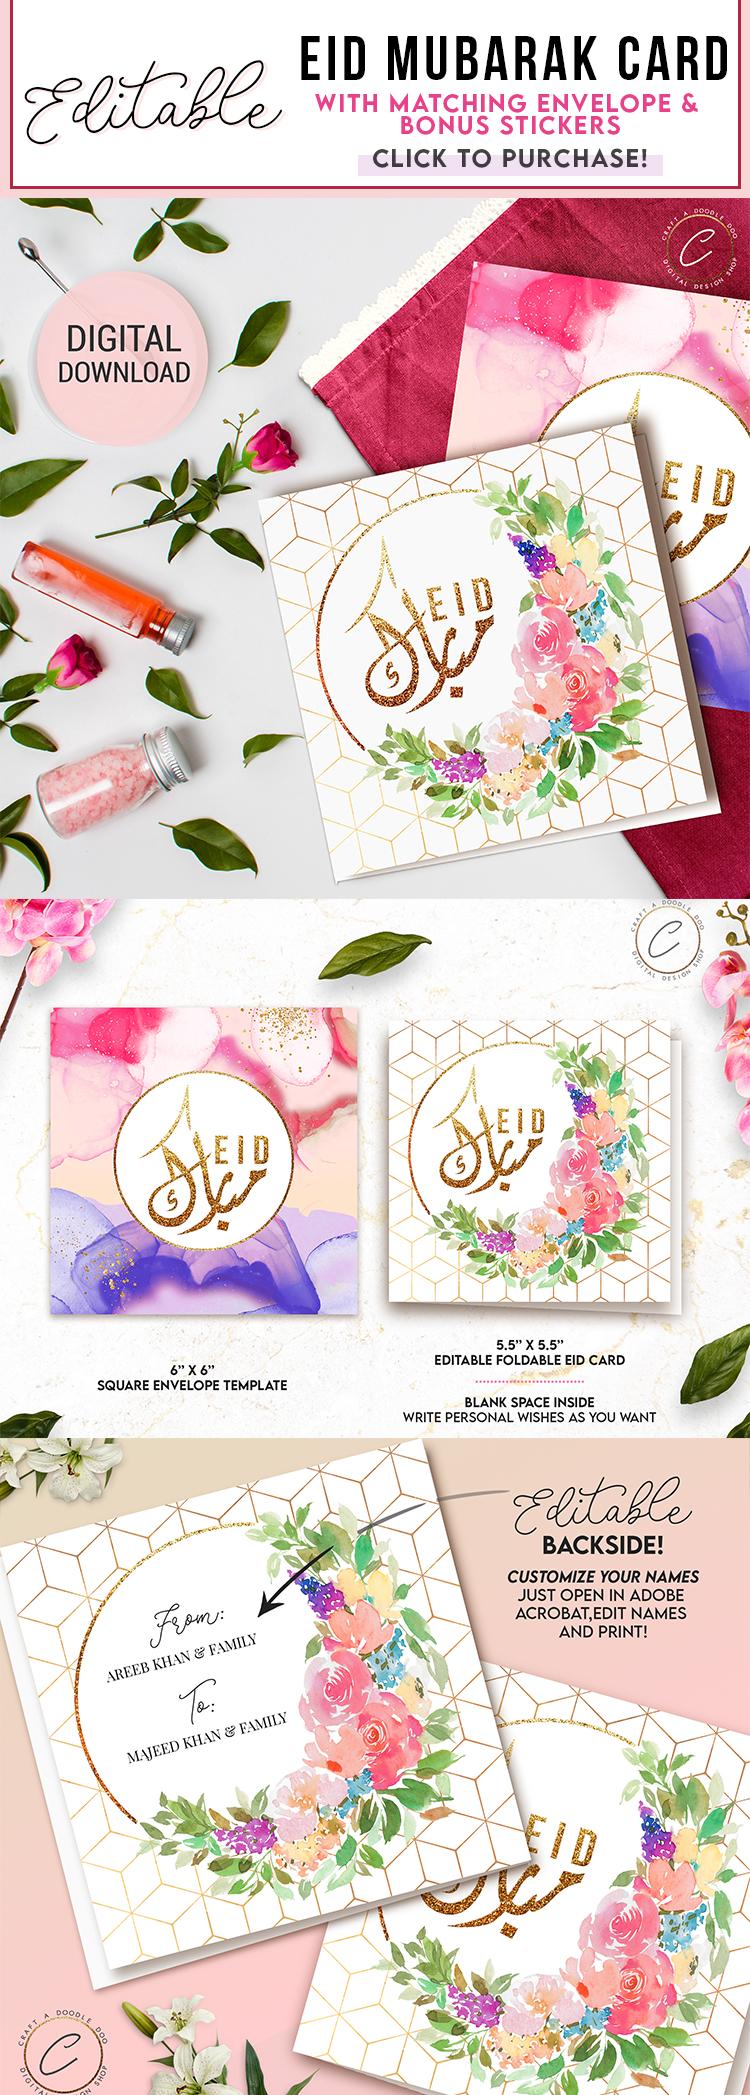 Customizable Elegant Watercolor Eid Card and Envelope by Craft A Doodle Doo #eidmubarakcard #editableidcard #eiduladha #freeeidprintable #eidwalldecor #eidwatercolordecor #cuteeiddecor #eiddecorideas #freepdftemplate